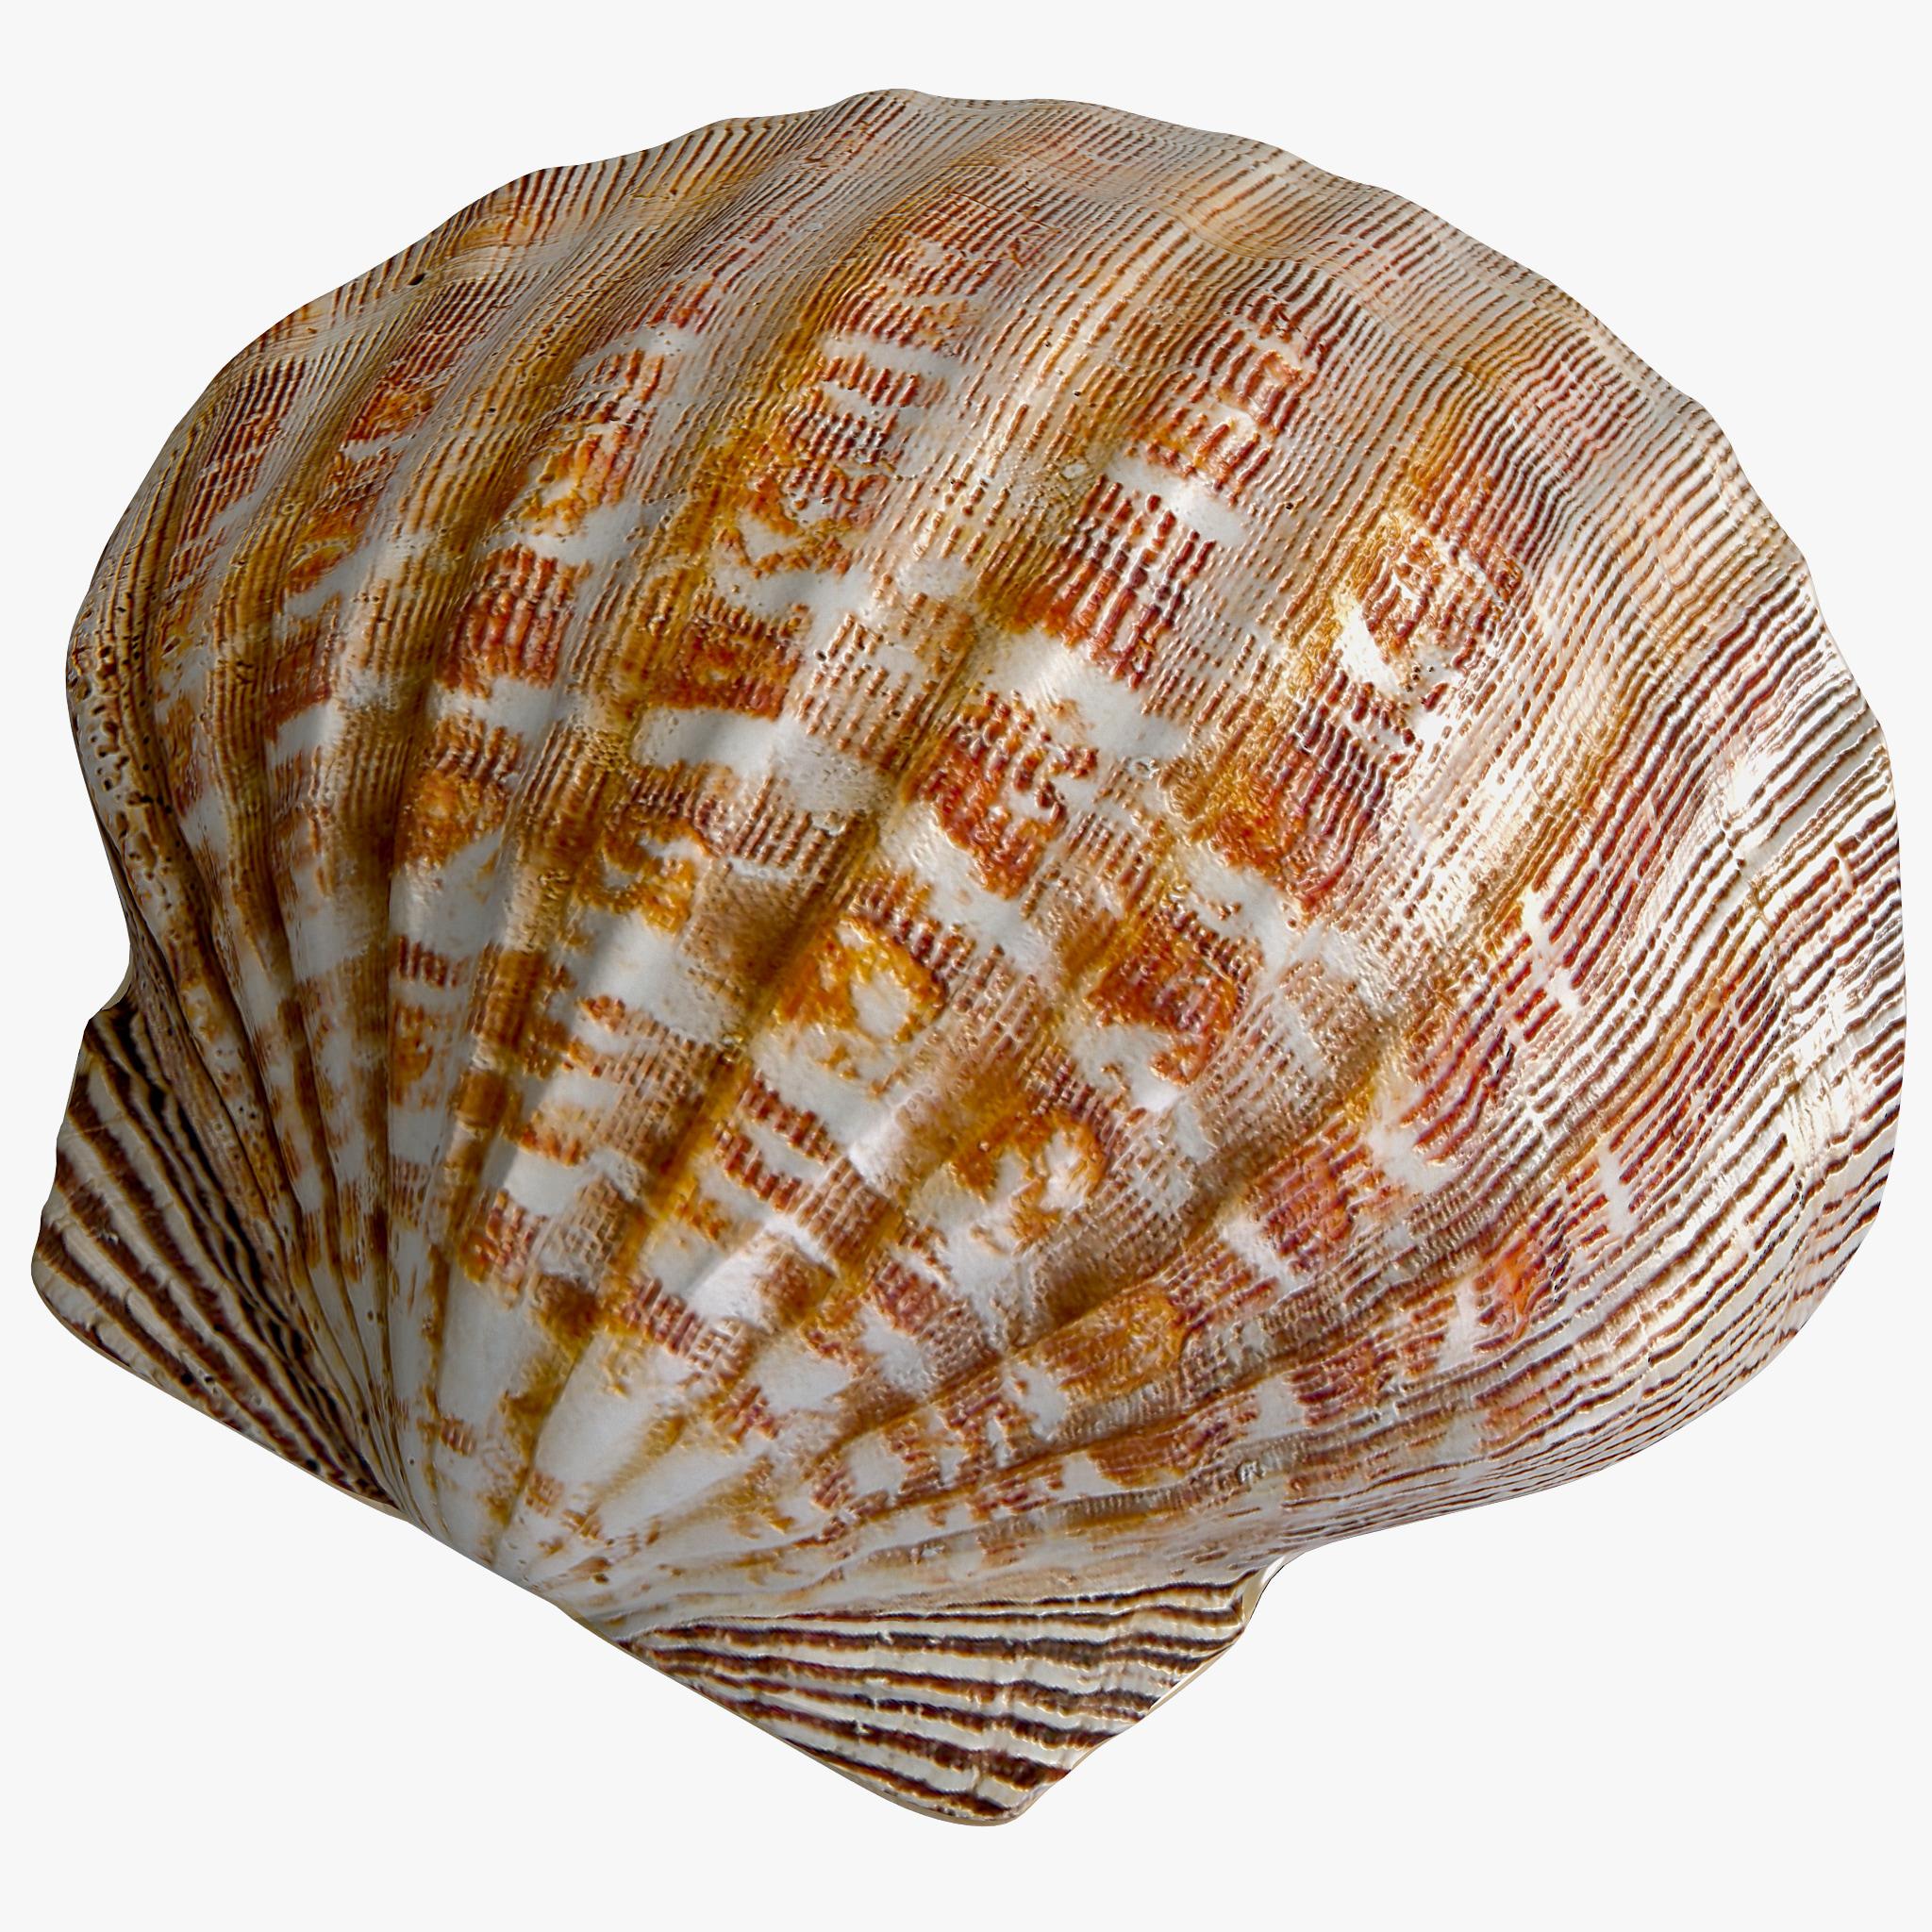 Clam Seashell 2_155.jpg